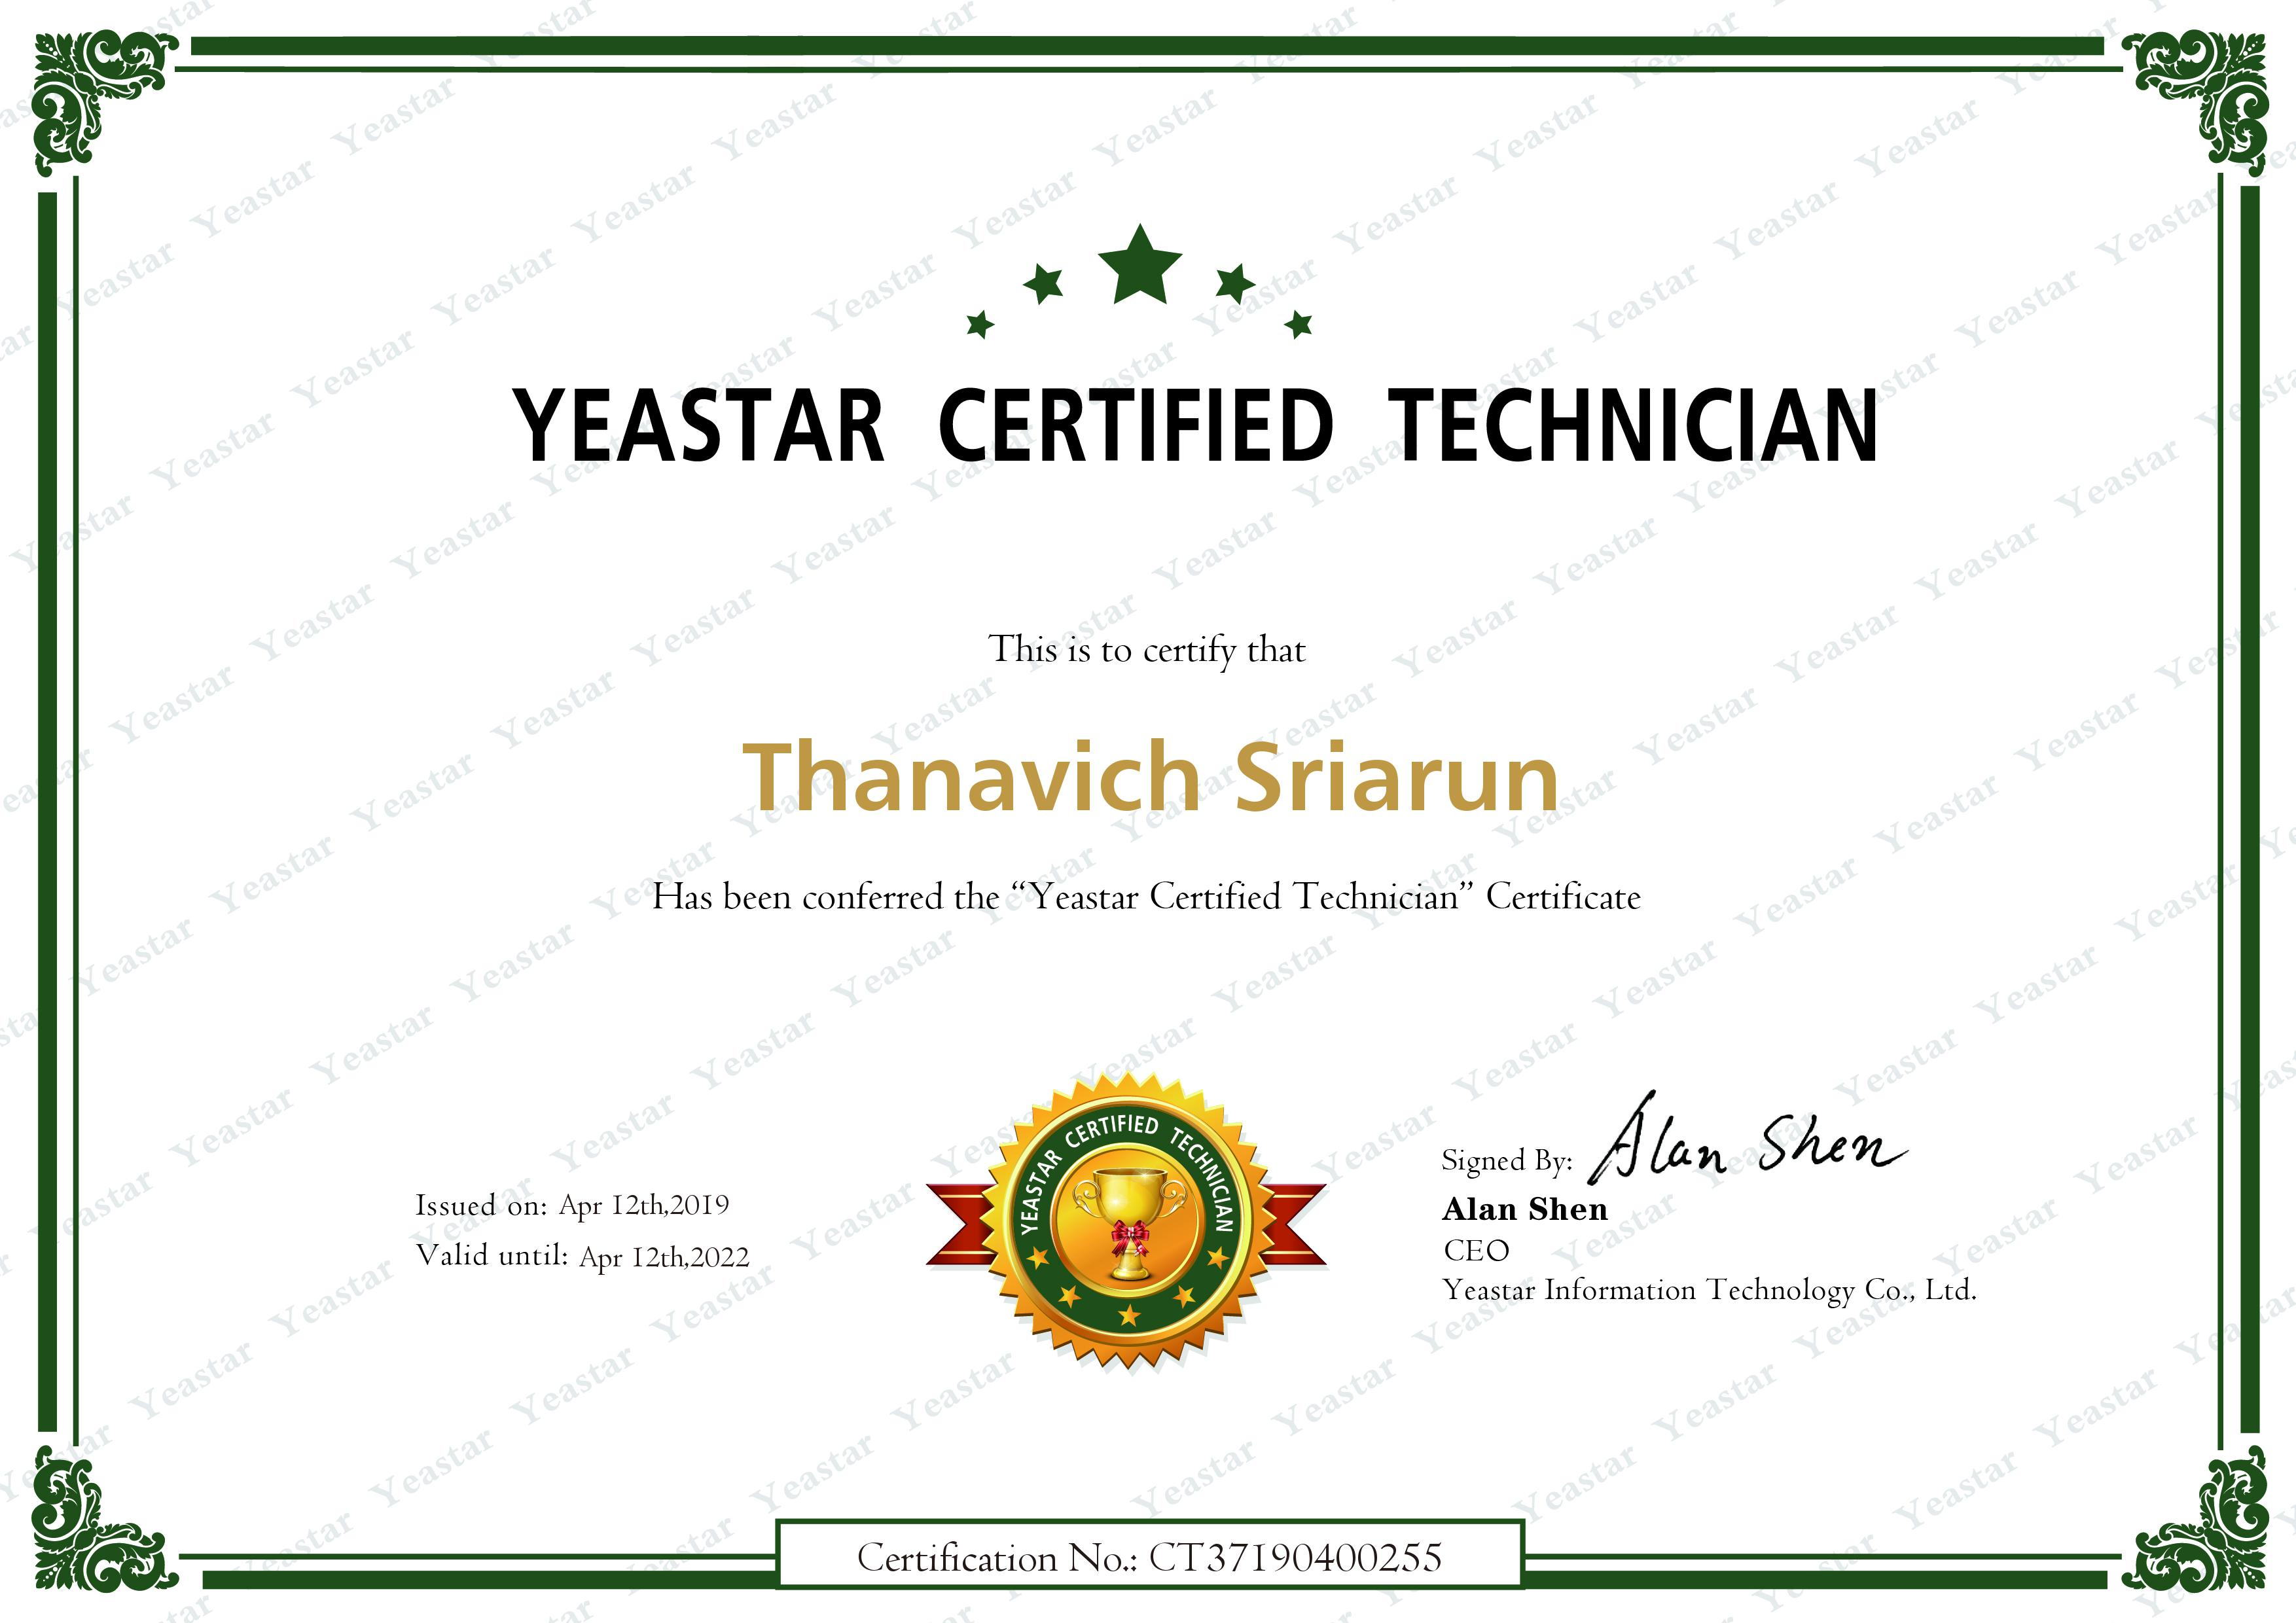 YeaStar Certificate